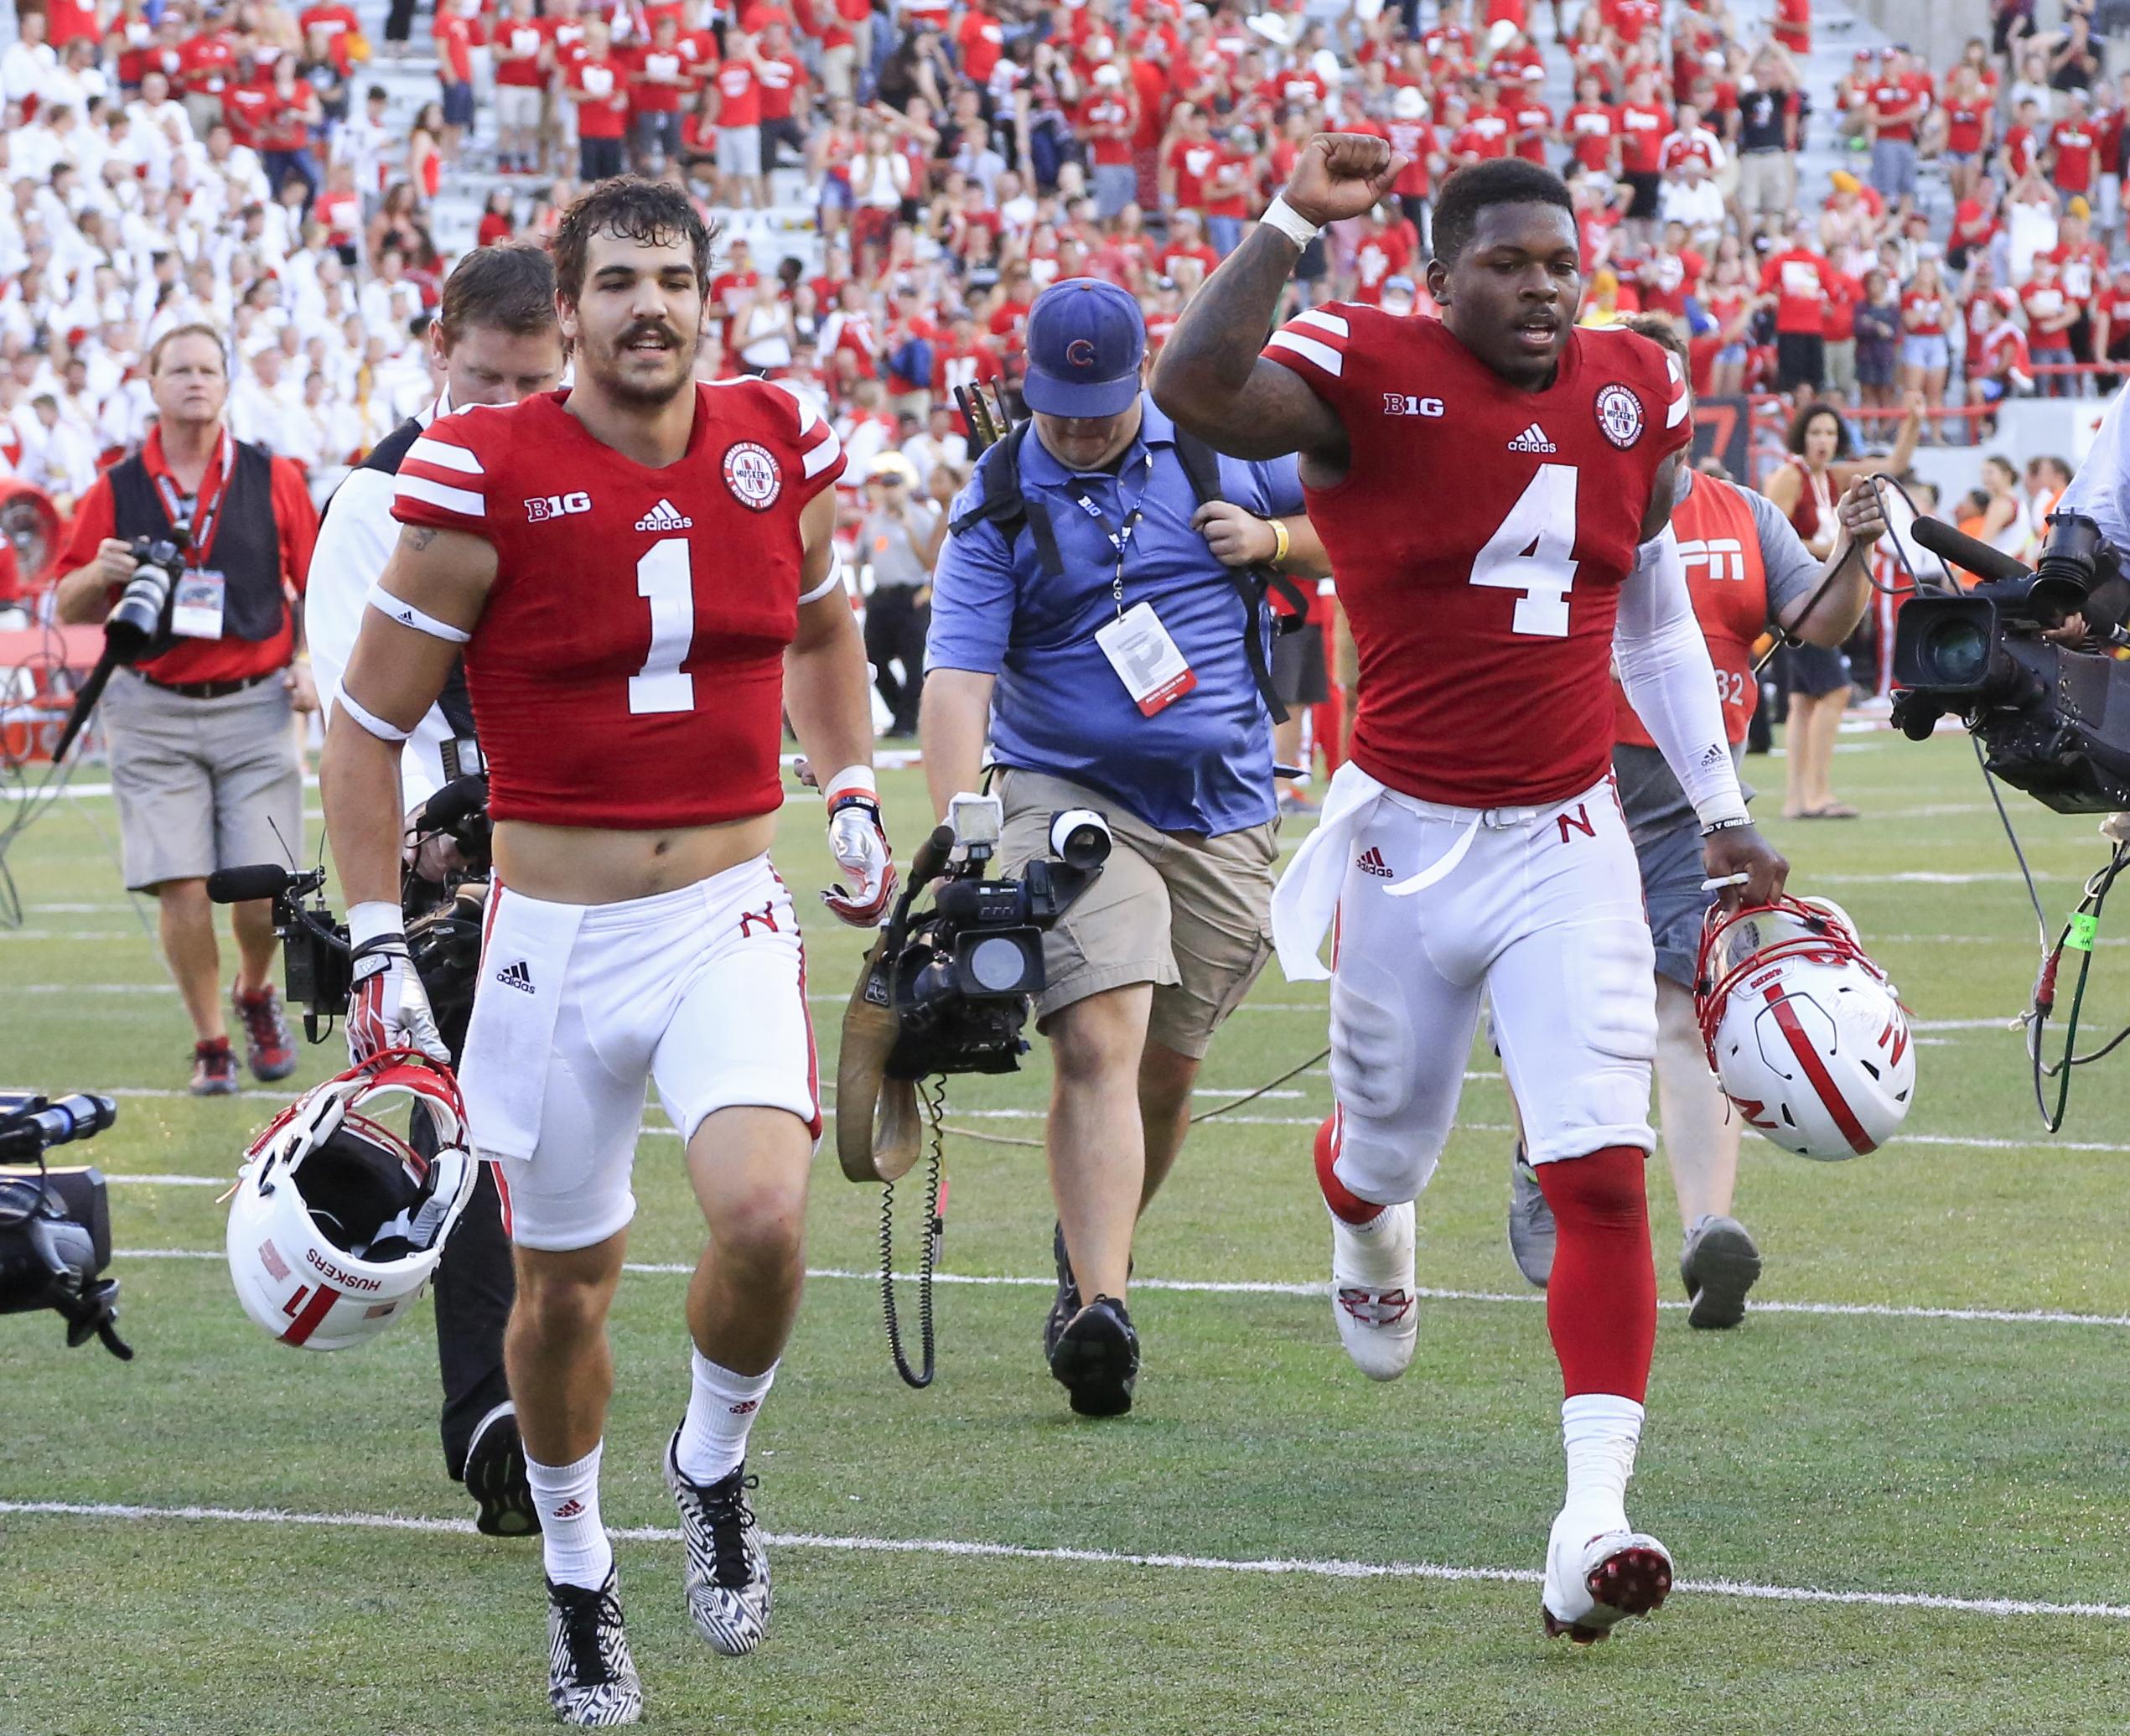 Nebraska quarterback Tommy Armstrong Jr. (4) and wide receiver Jordan Westerkamp (1) run off the field following an NCAA college football game against Oregon in Lincoln, Neb., Saturday, Sept. 17, 2016. Nebraska won 35-32. (AP Photo/Nati Harnik)